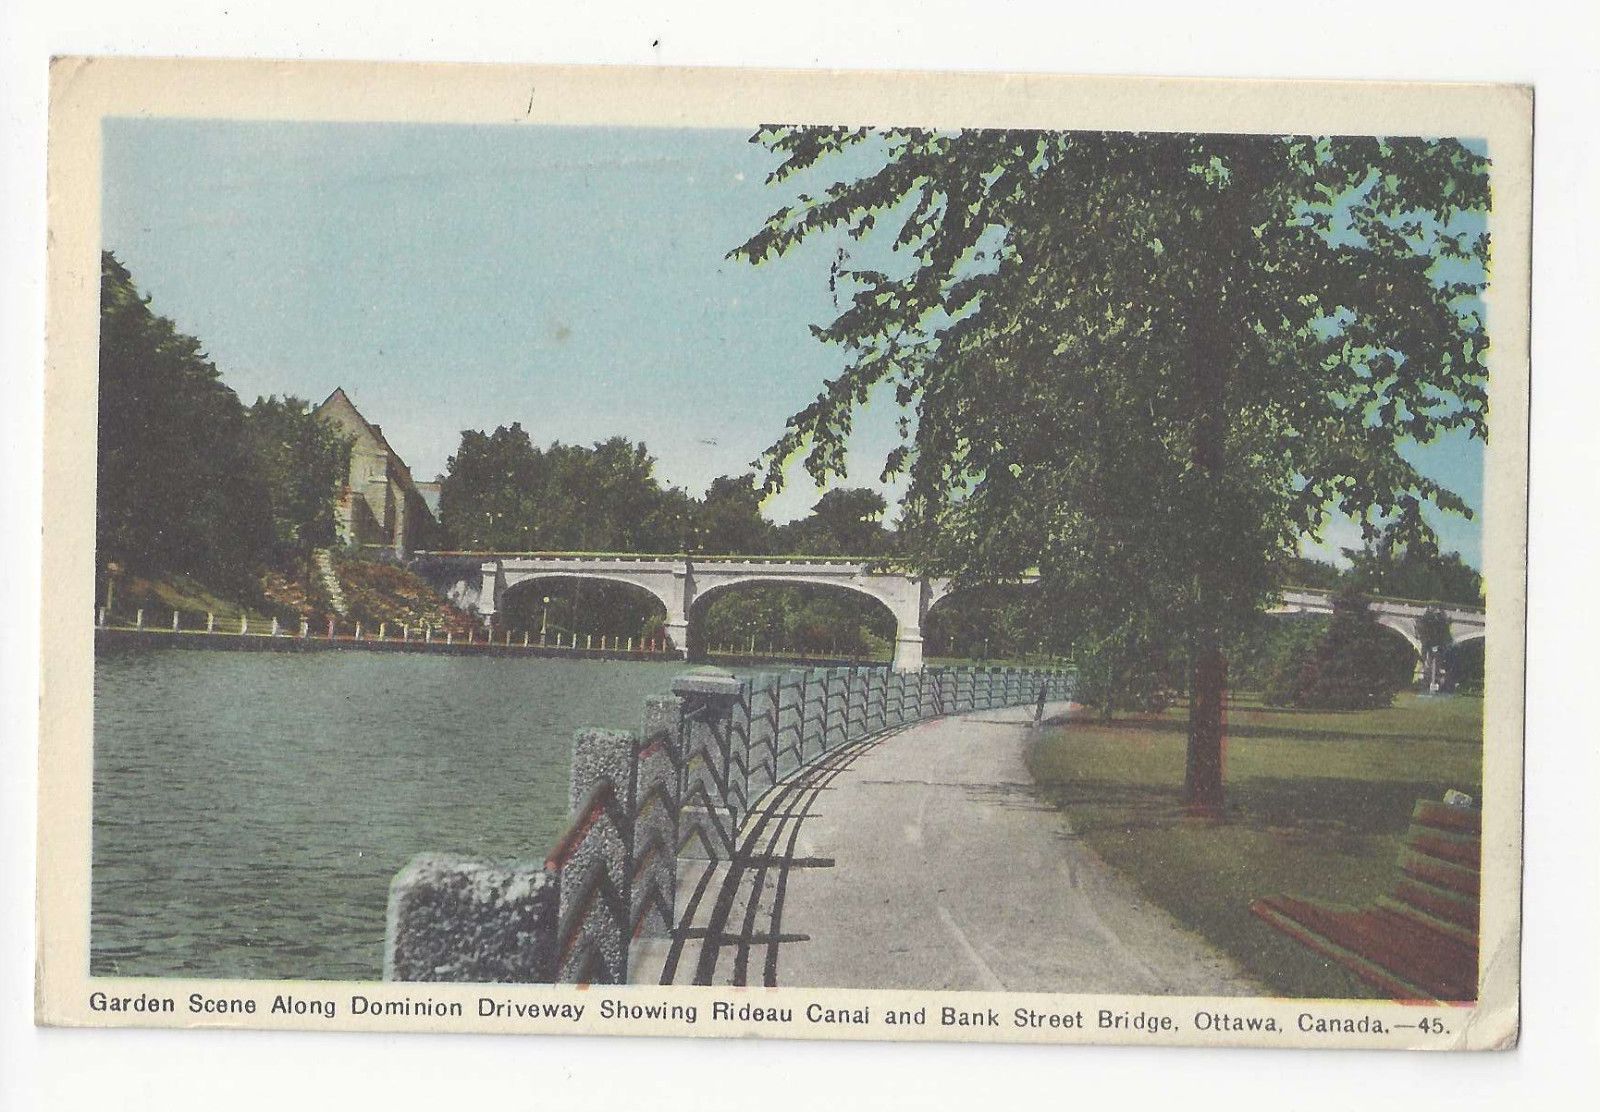 Canada Ottawa Dominion Driveway Rideau Canal Bank Street Bridge Postcard 1947